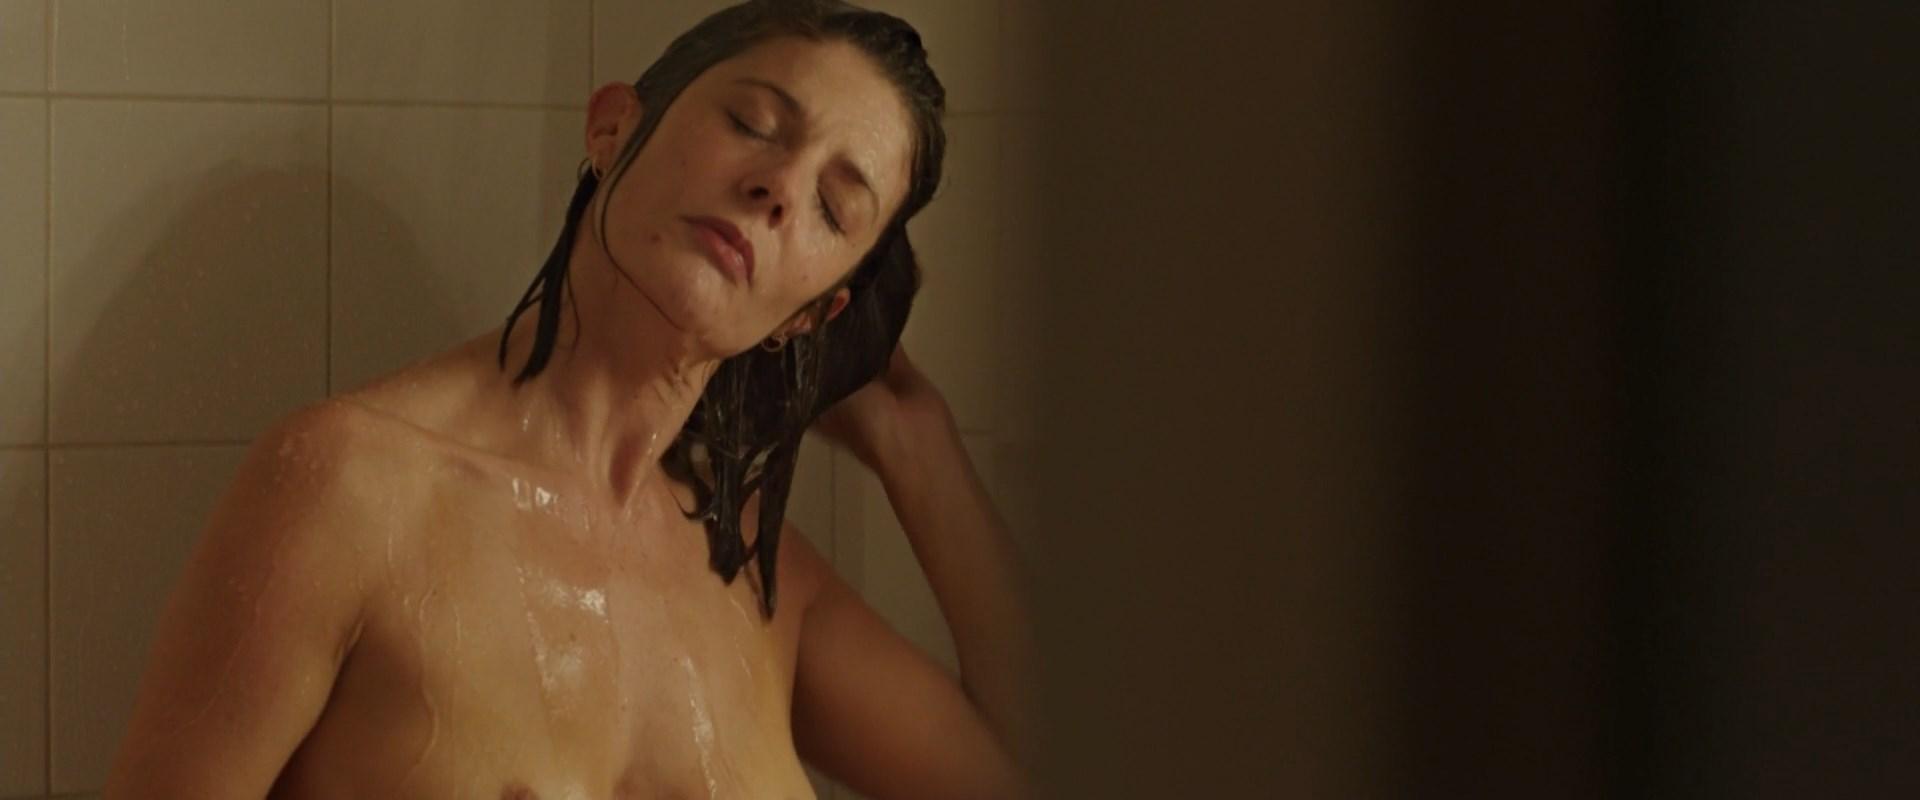 Sophie marceau ines sastre chiara caselli beyond the clouds - 3 10